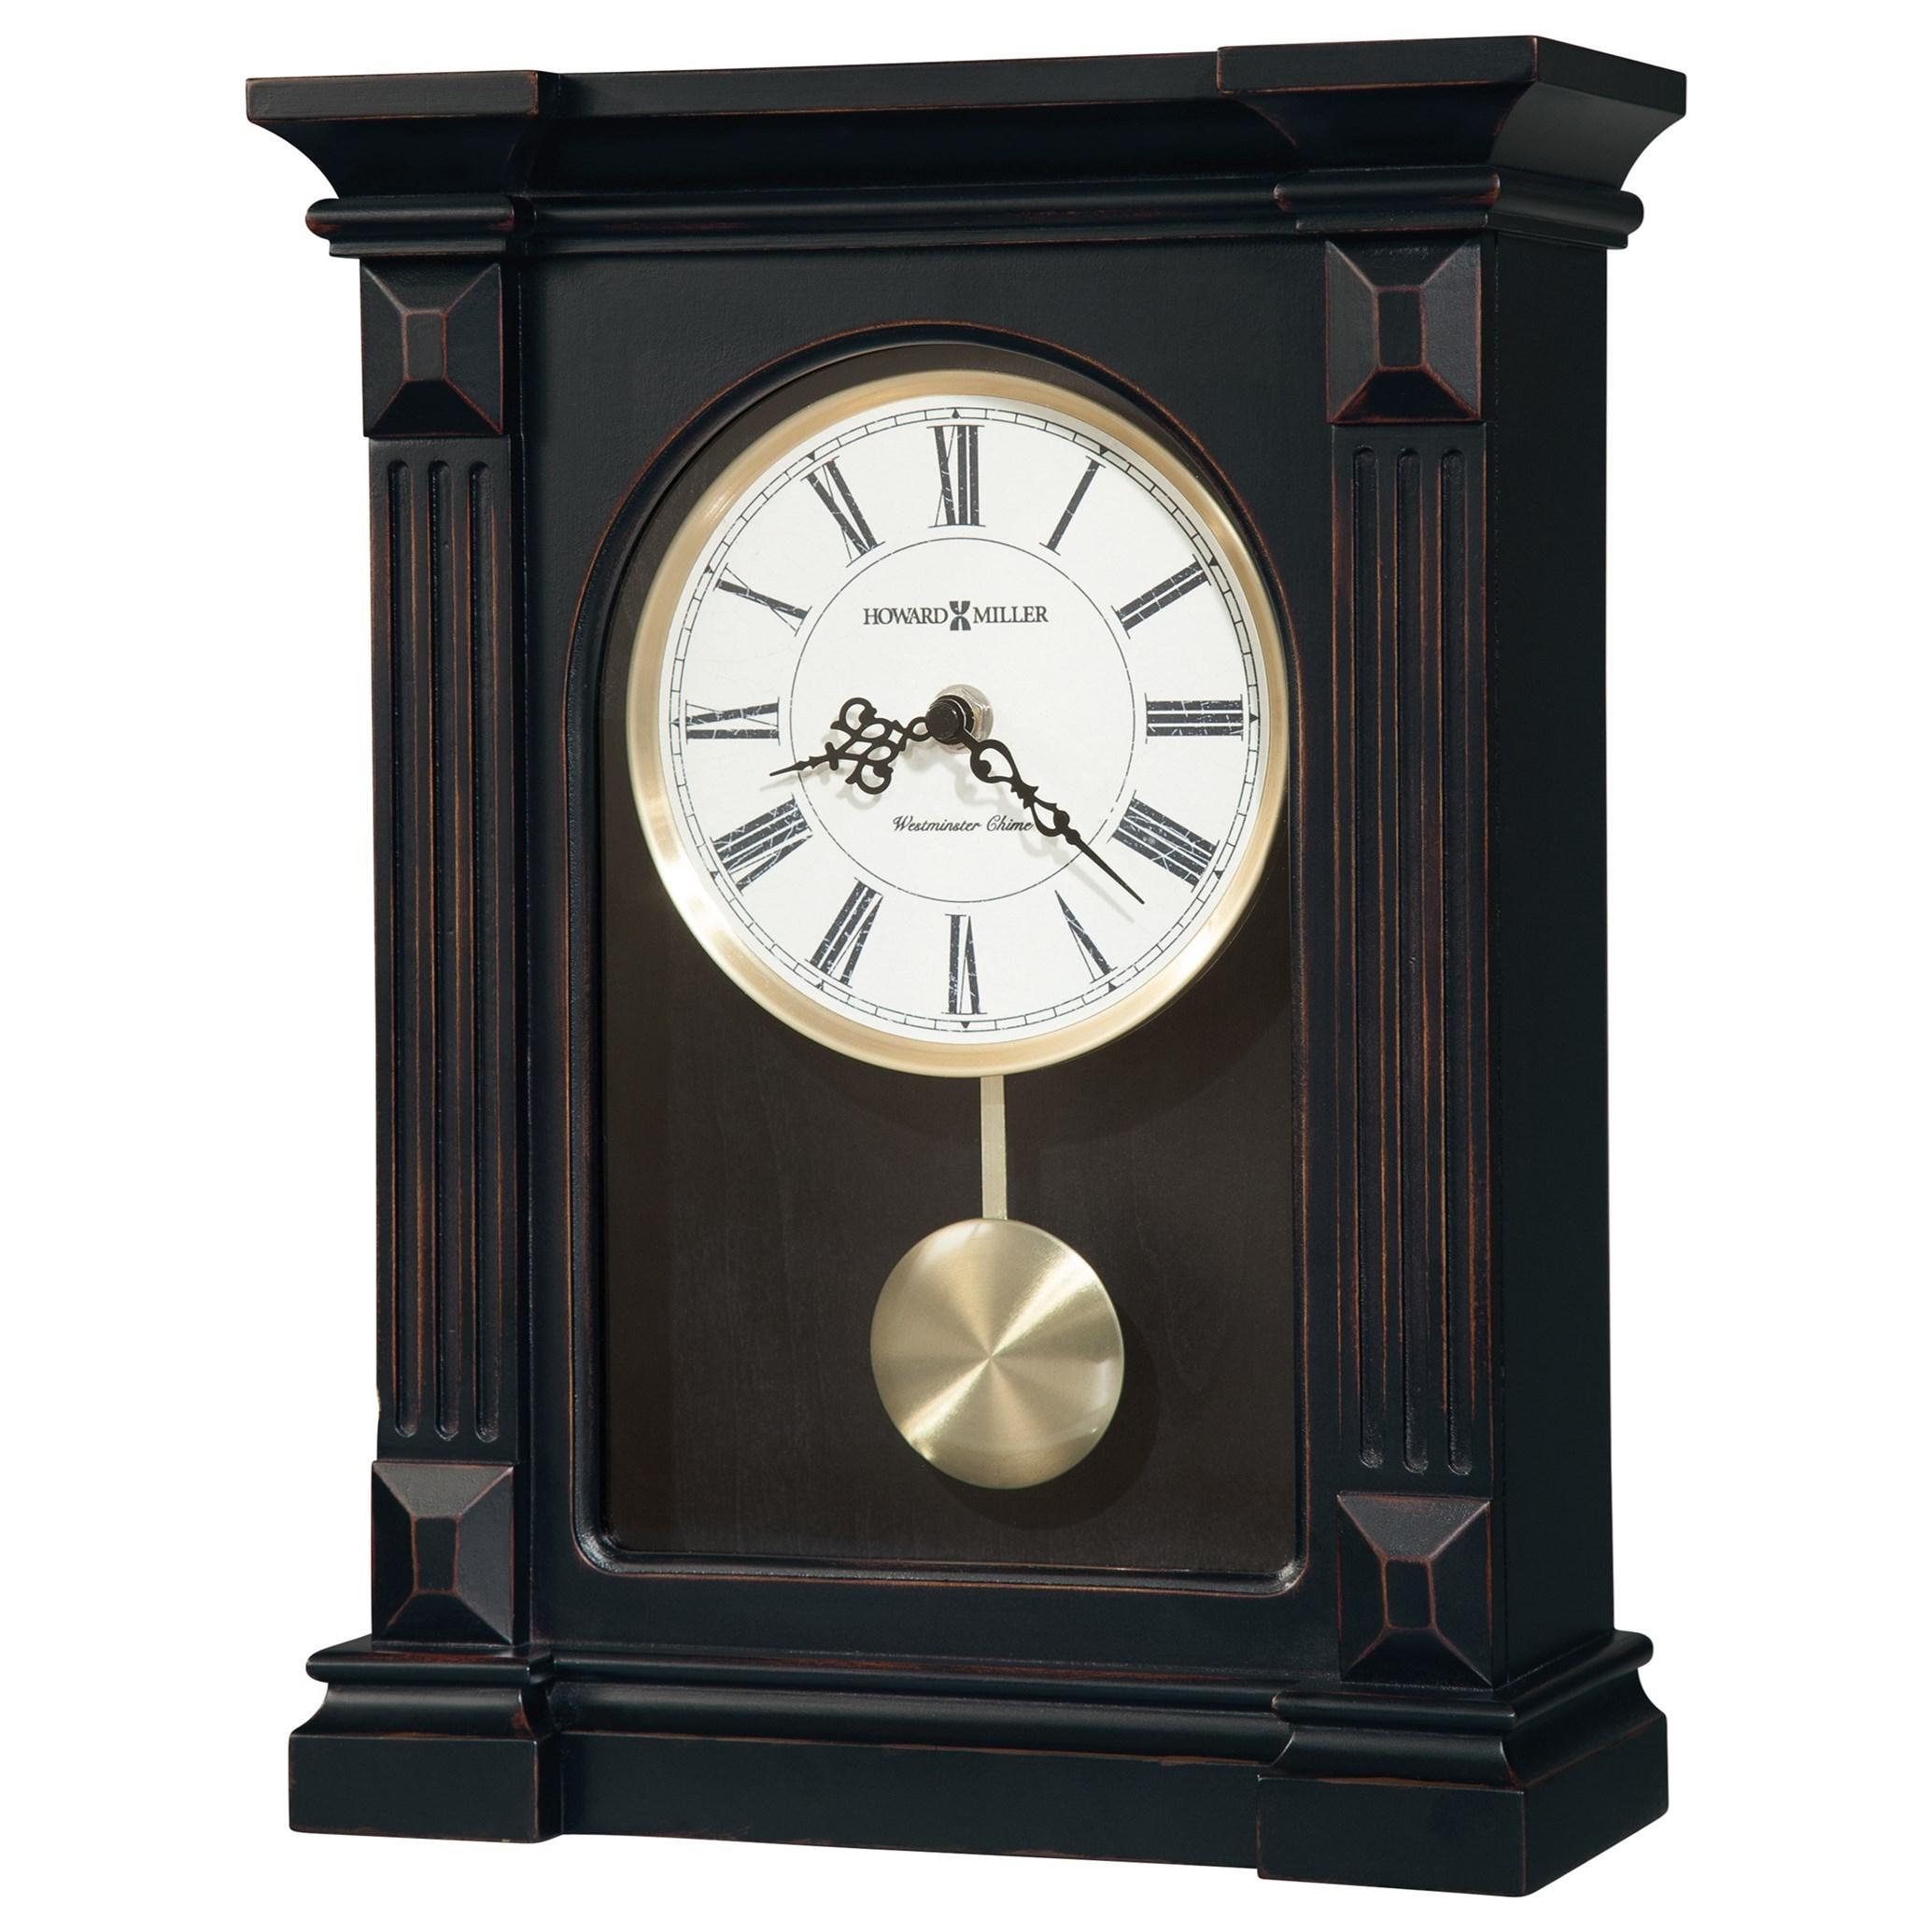 Howard Miller Table U0026 Mantel Clocks Mia Mantel Clock   Item Number: 635 187